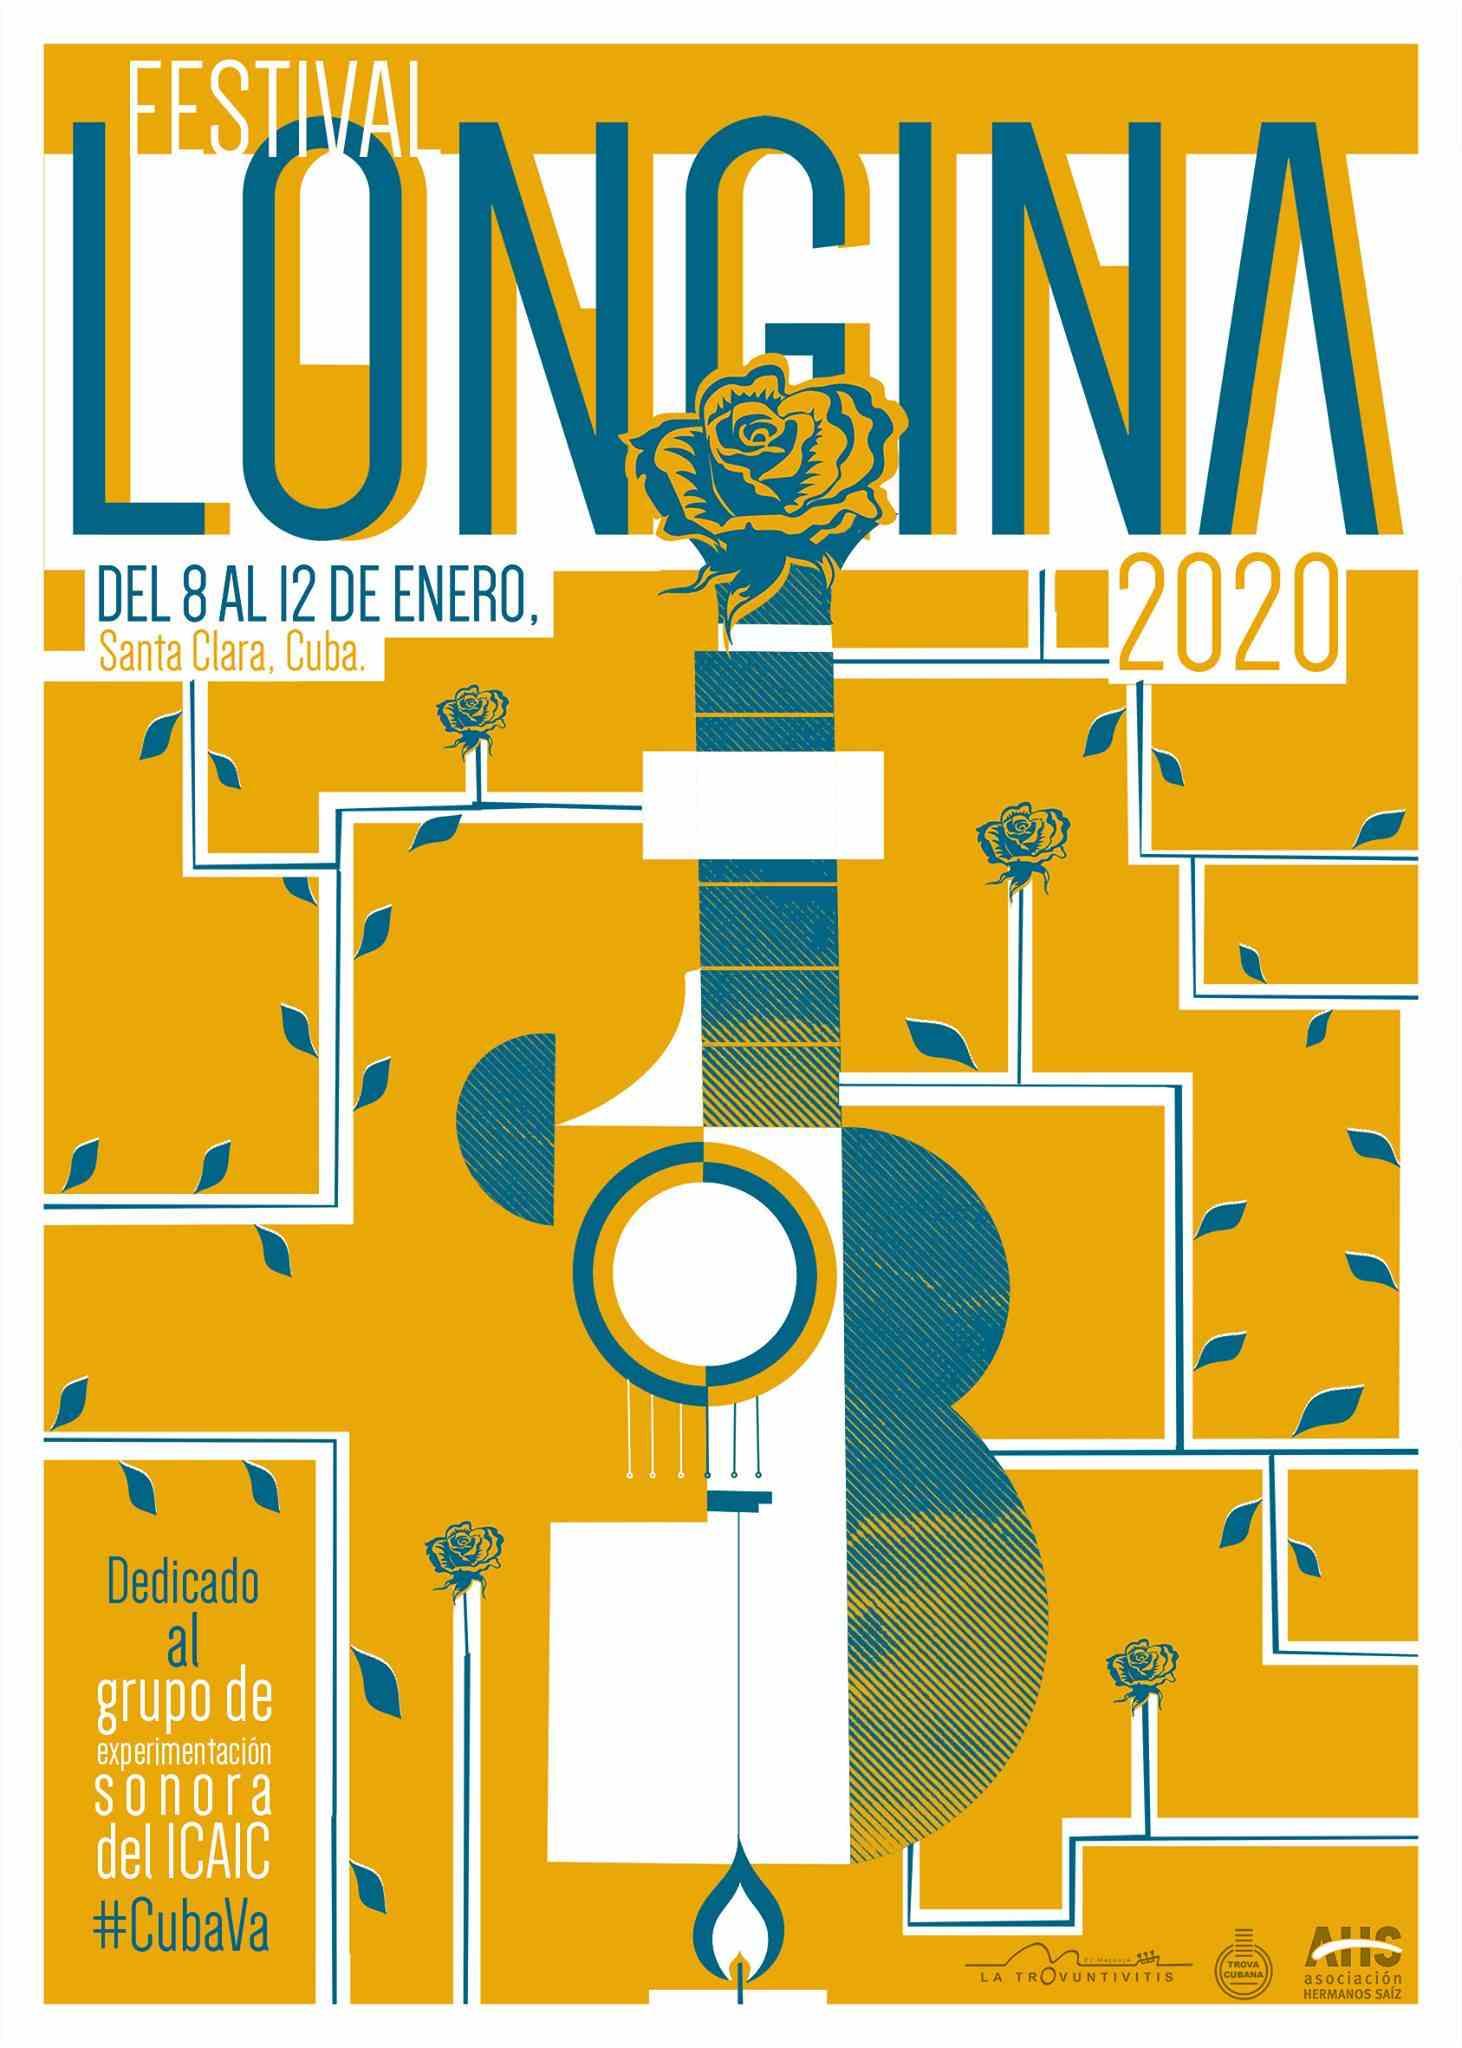 Cartel del Festival Longina 2020. Diseño: Alejandro Cuervo.